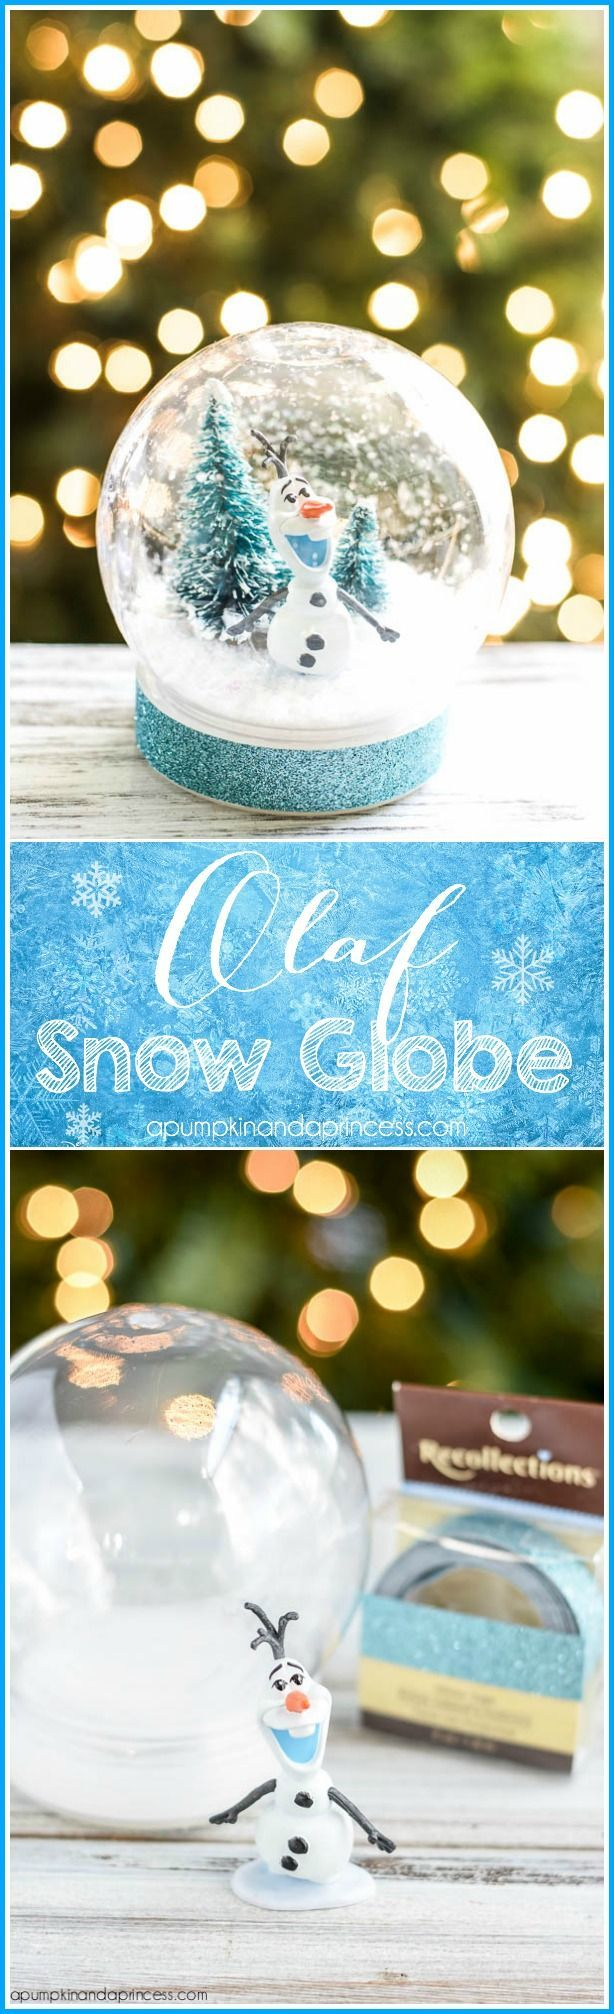 Make an Olaf Snow Globe!